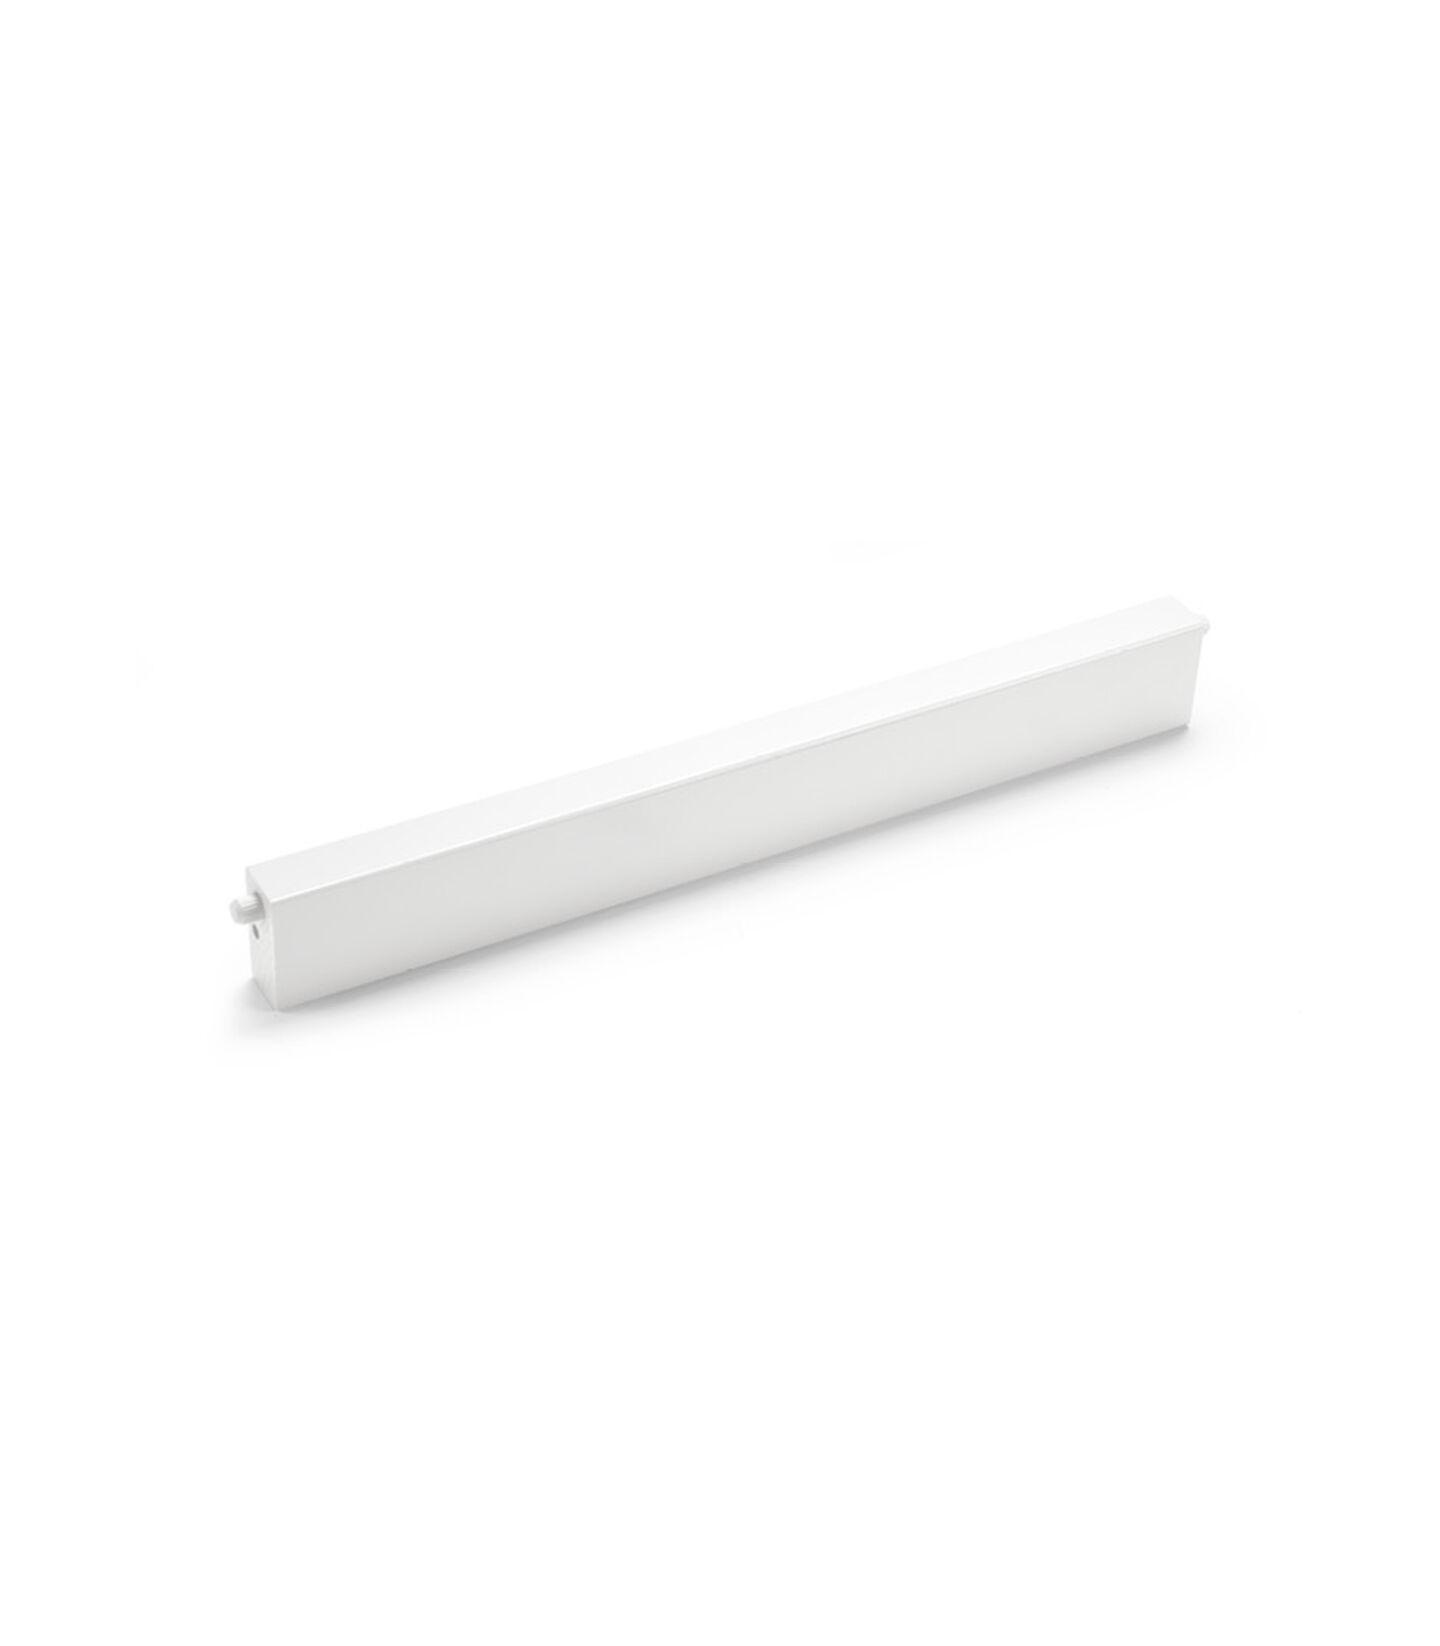 108607 Tripp Trapp Floorbrace White (Spare part). view 1